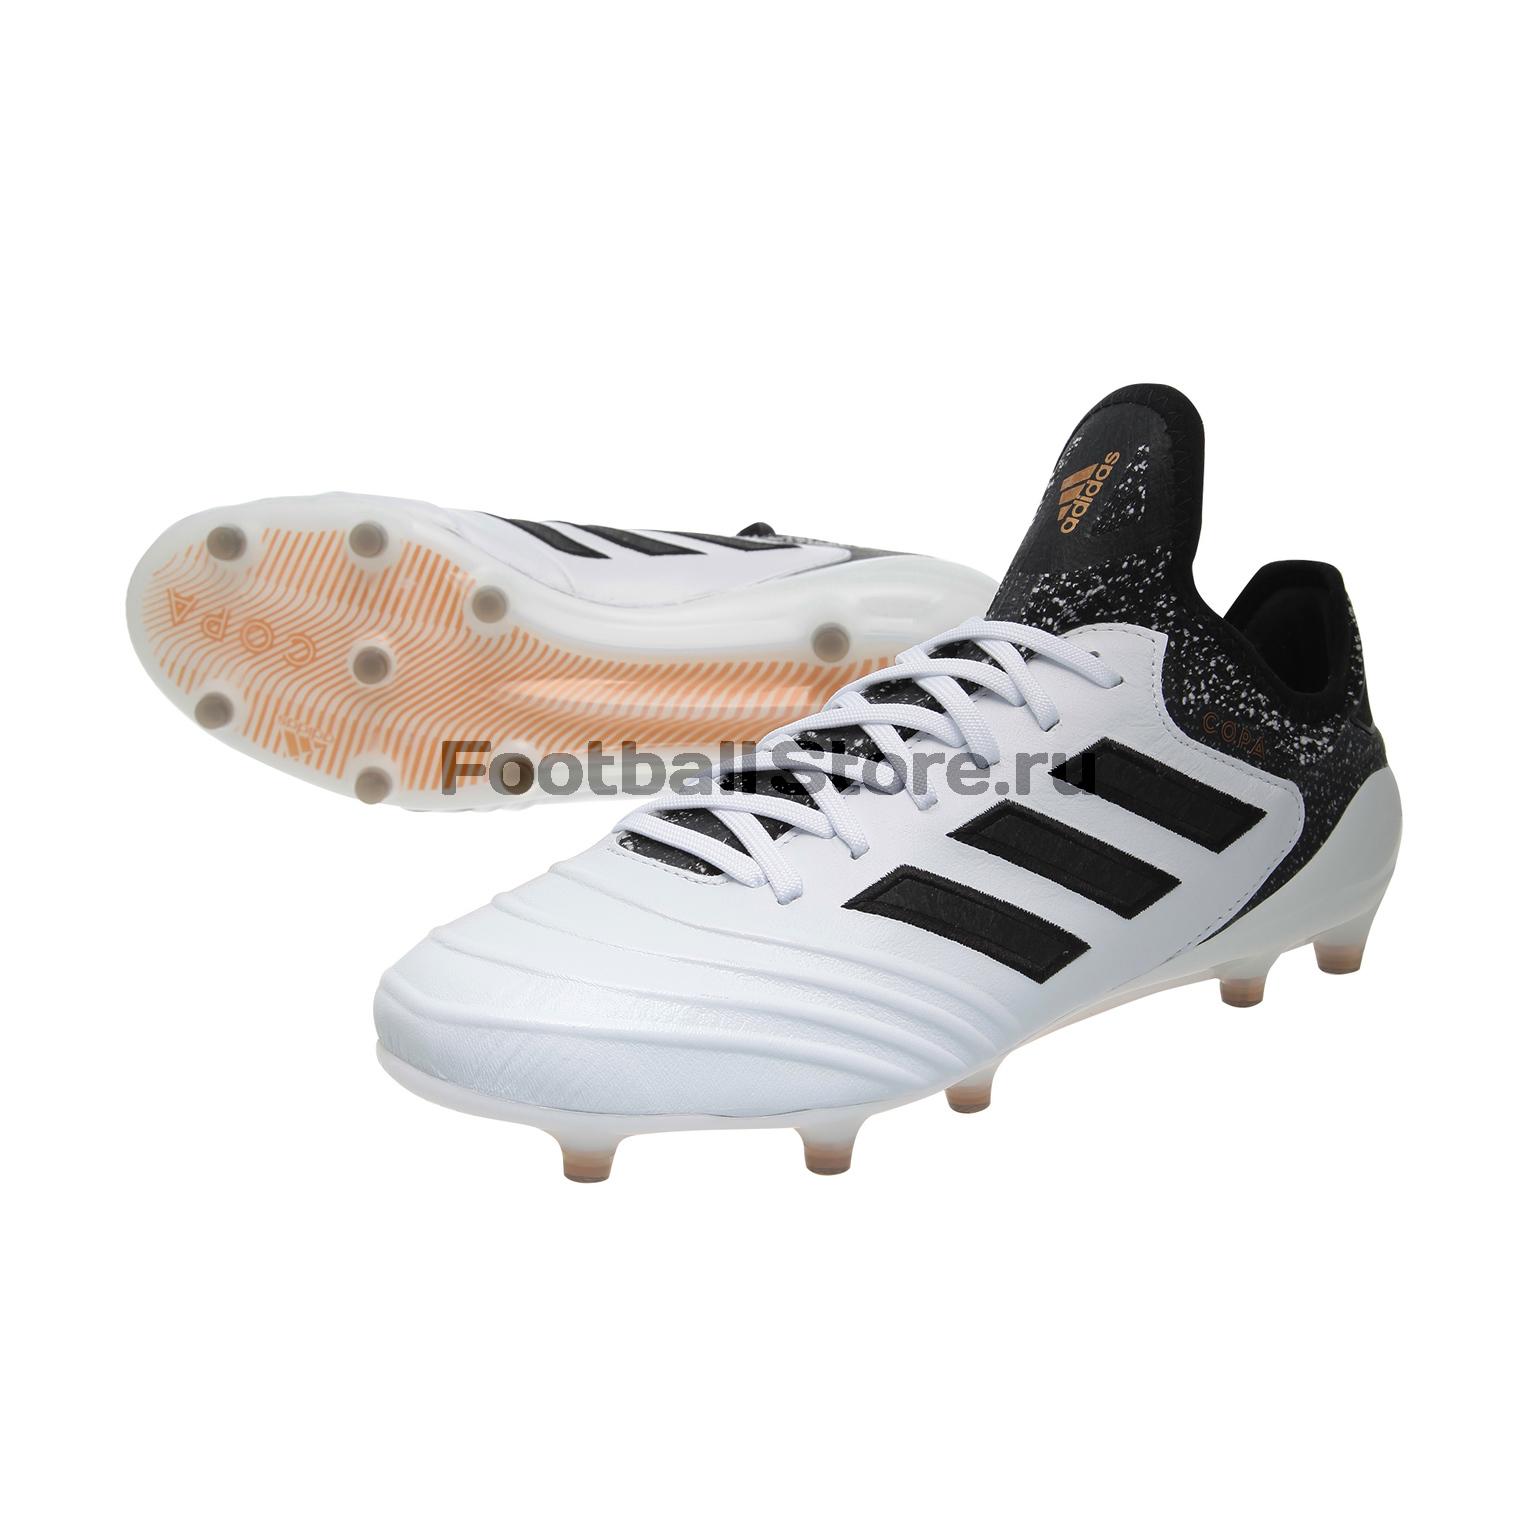 Бутсы Adidas Copa 18.1 FG BB6356 бутсы adidas x 17 1 fg bb6353